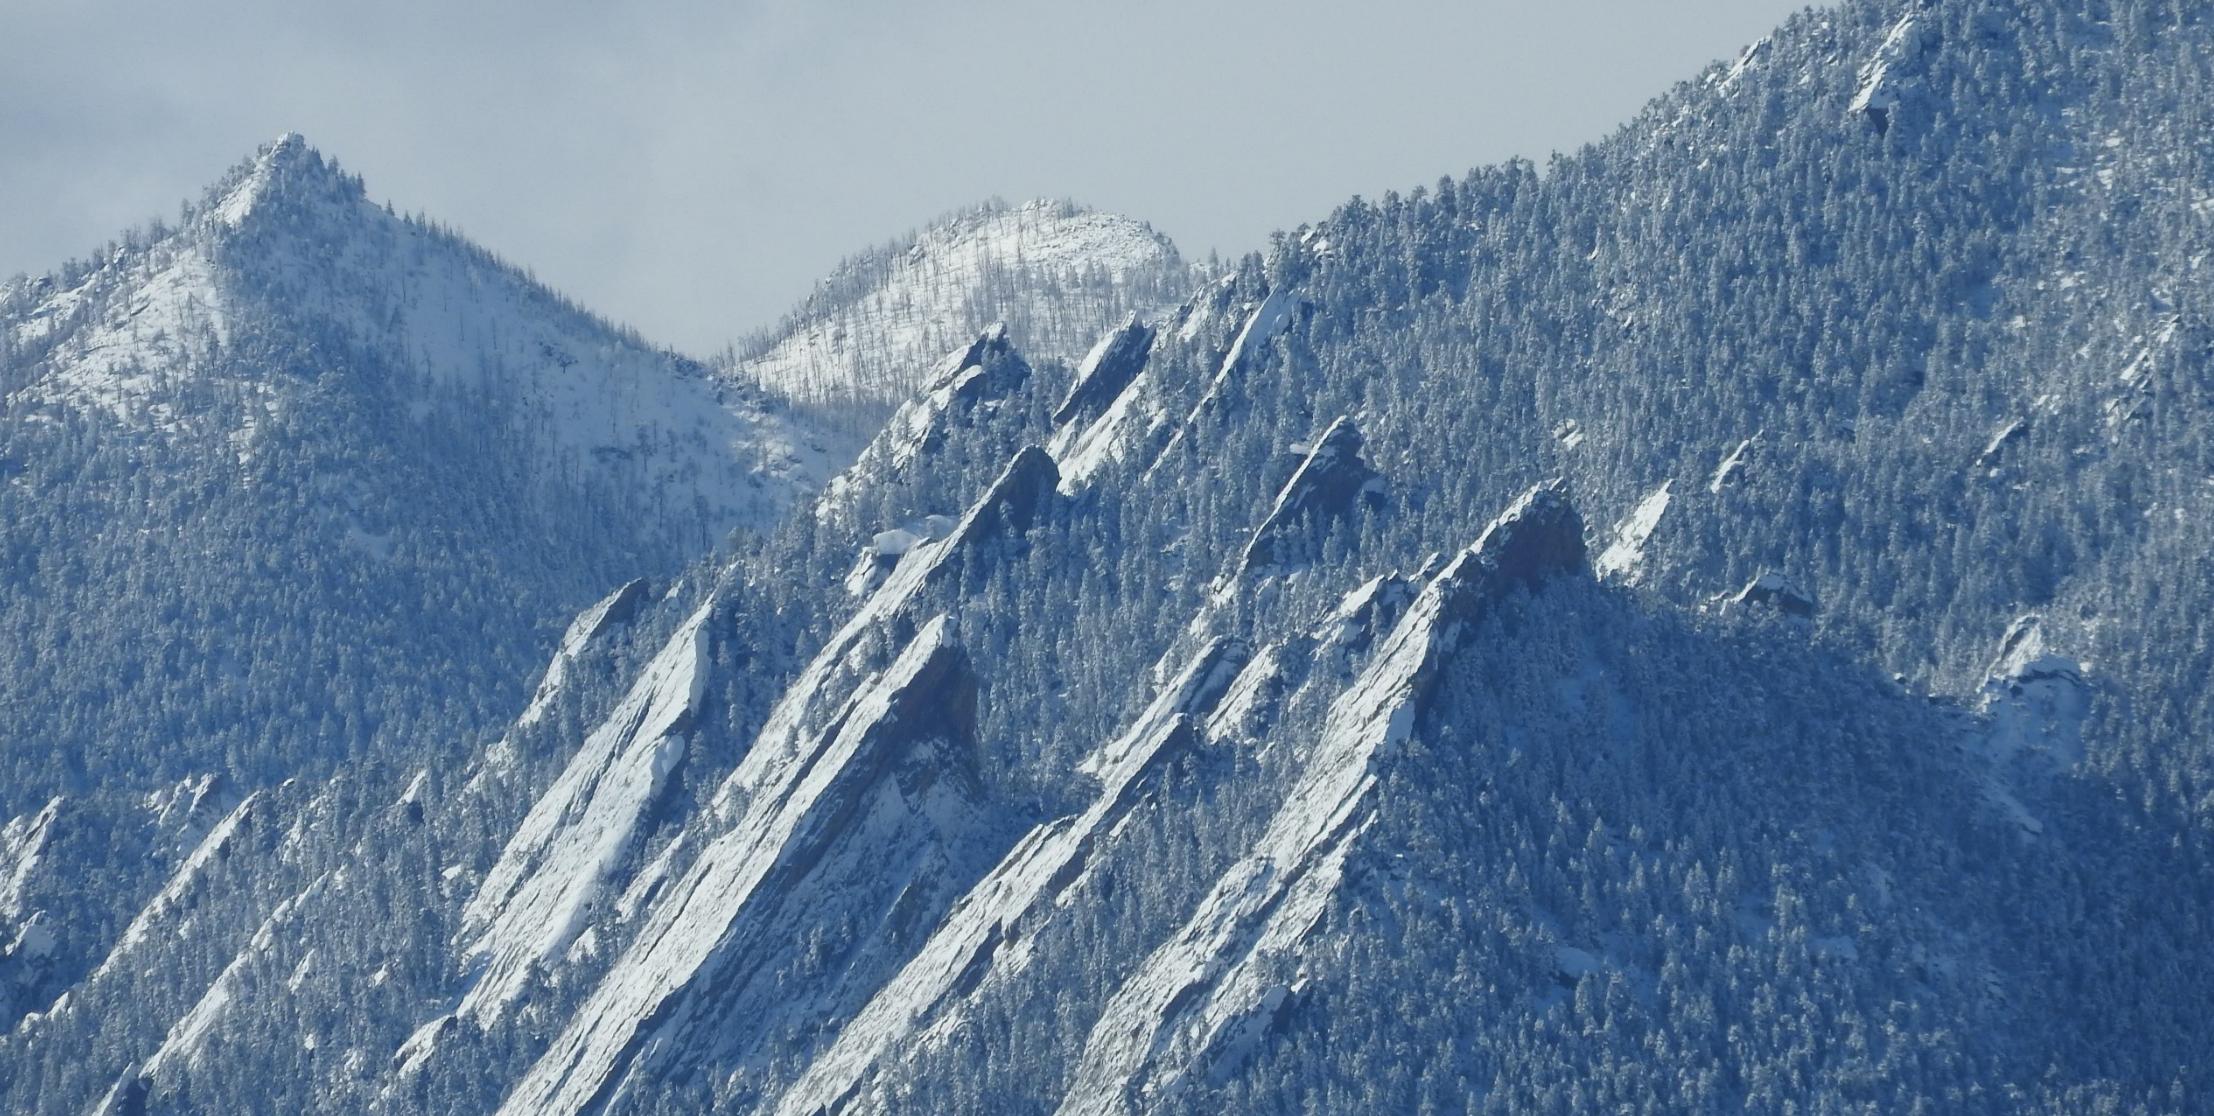 Boulder_Flatirons_Snow_March19